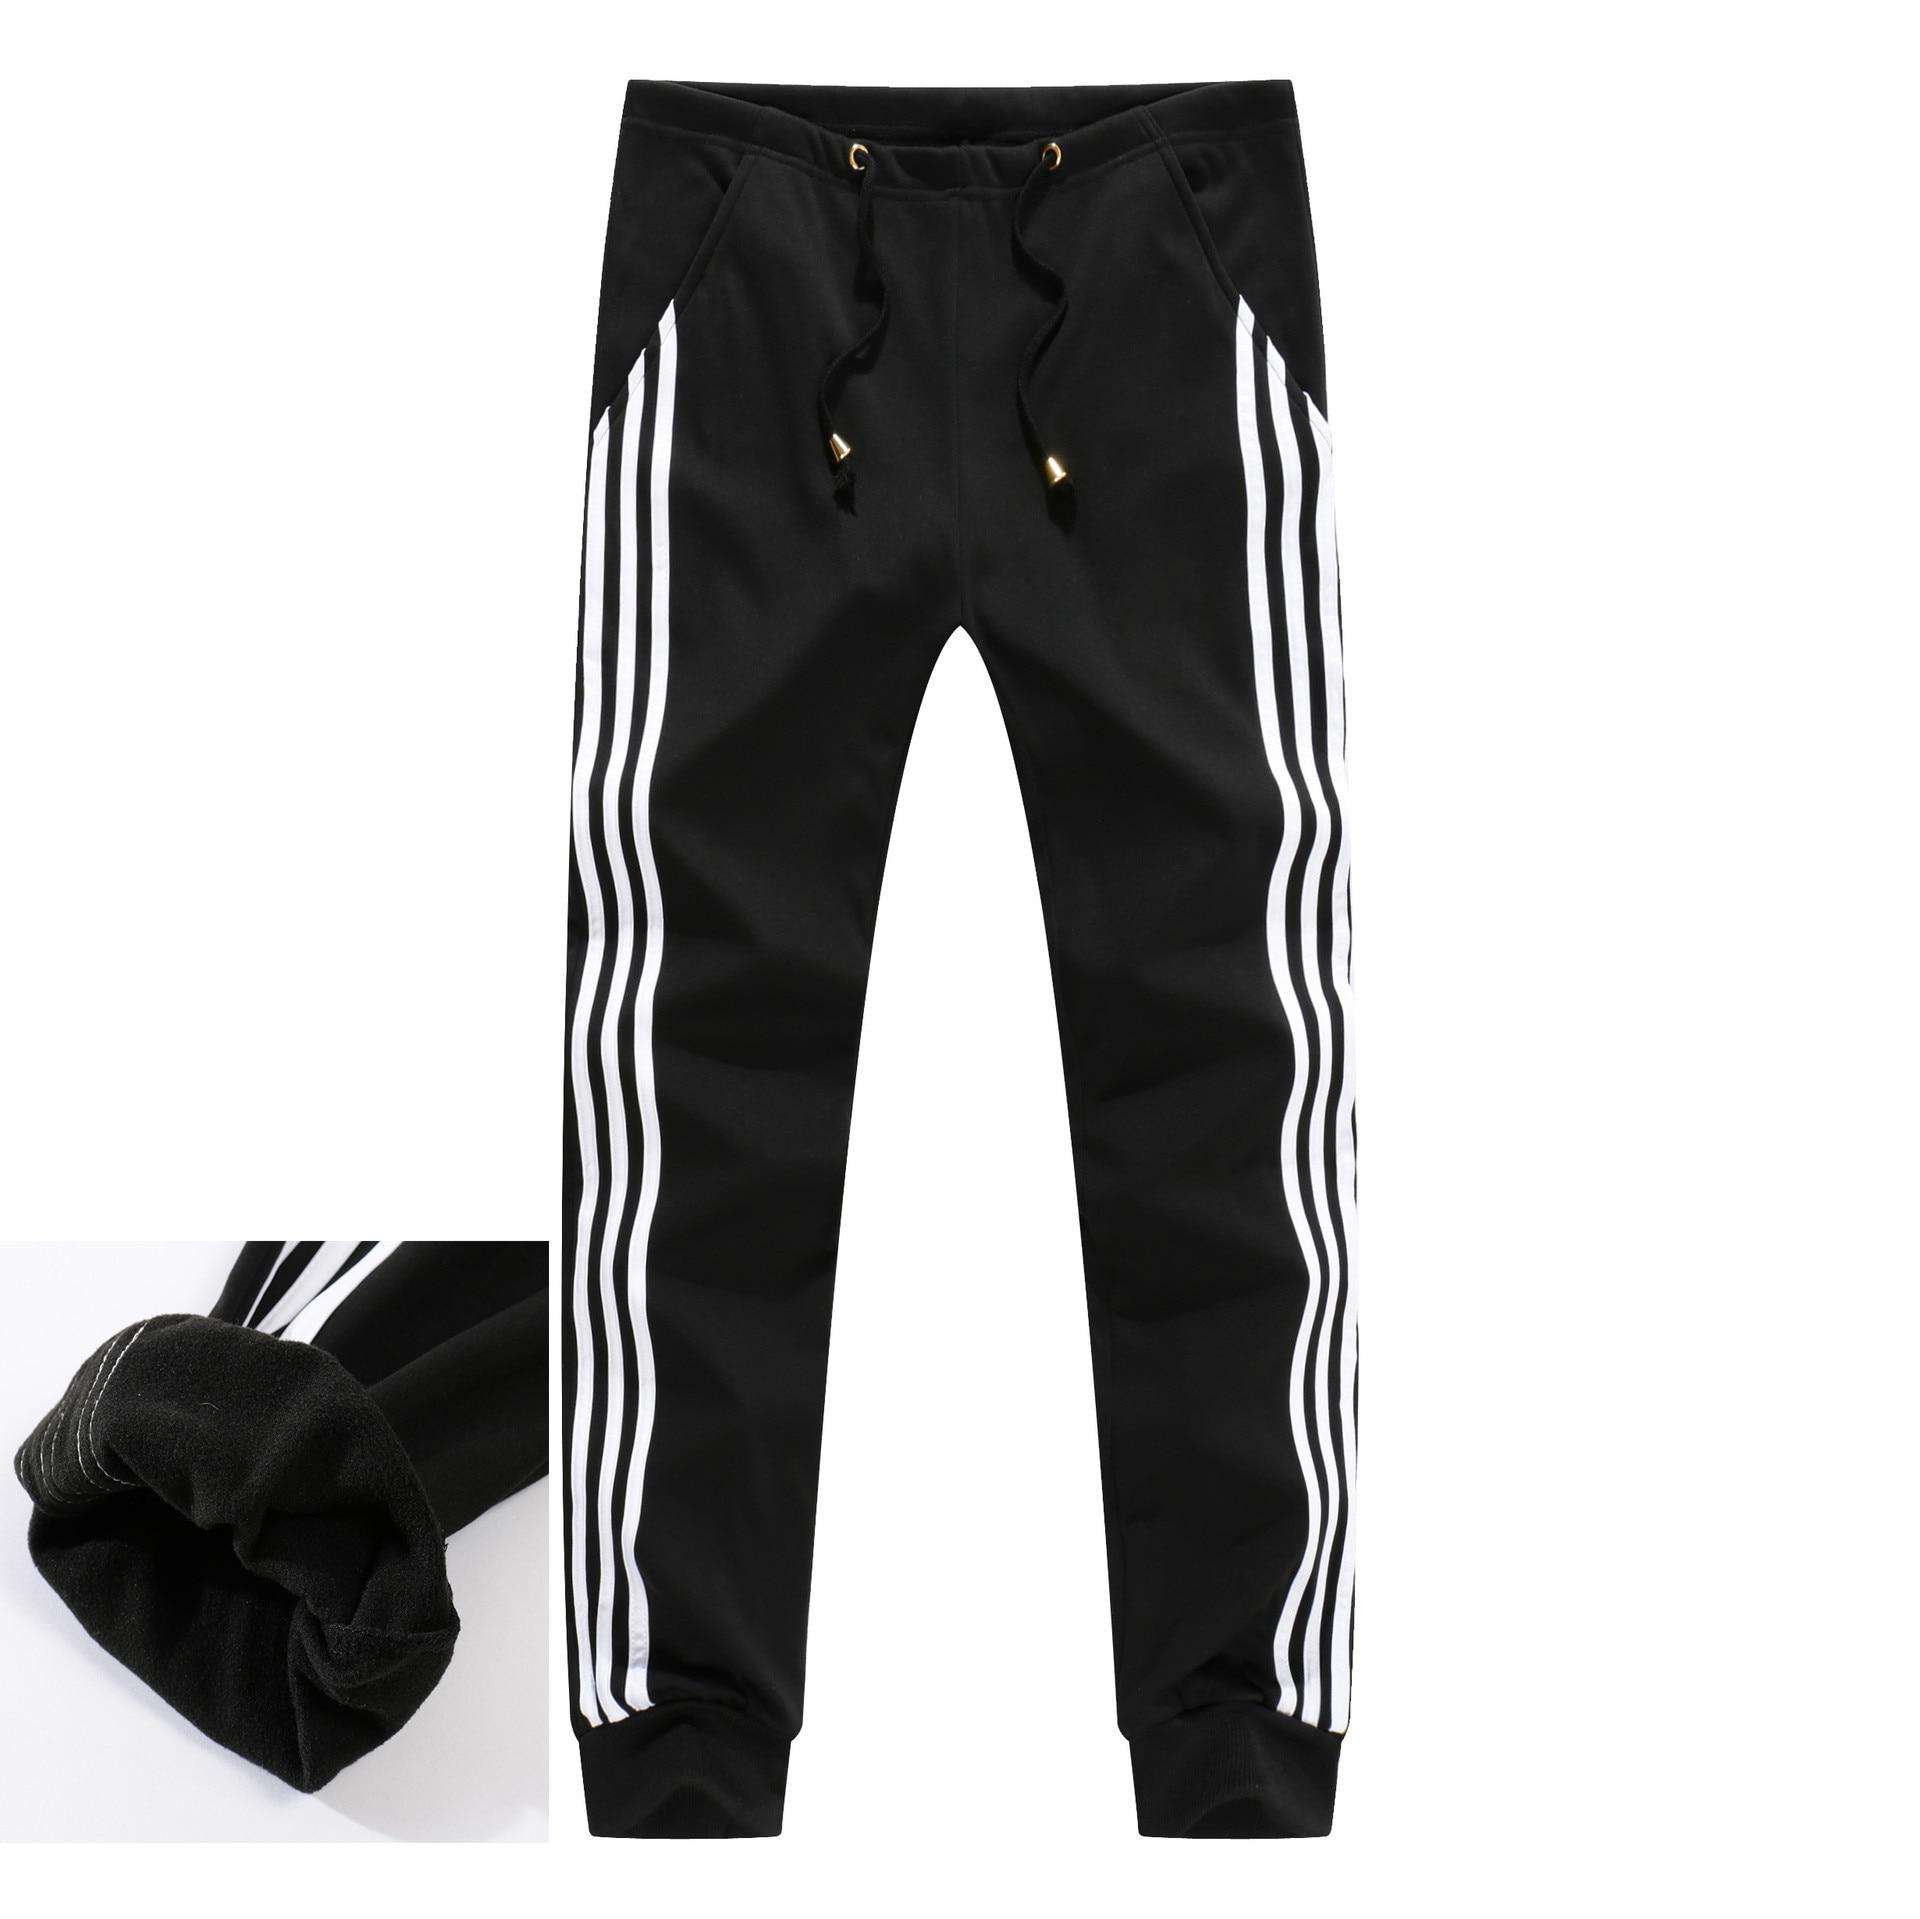 Men's Fleece Lining Sweatpants Men Winter Warm Joggers Track Pants Male Bodybuilding Fitness Thick Casual Trousers